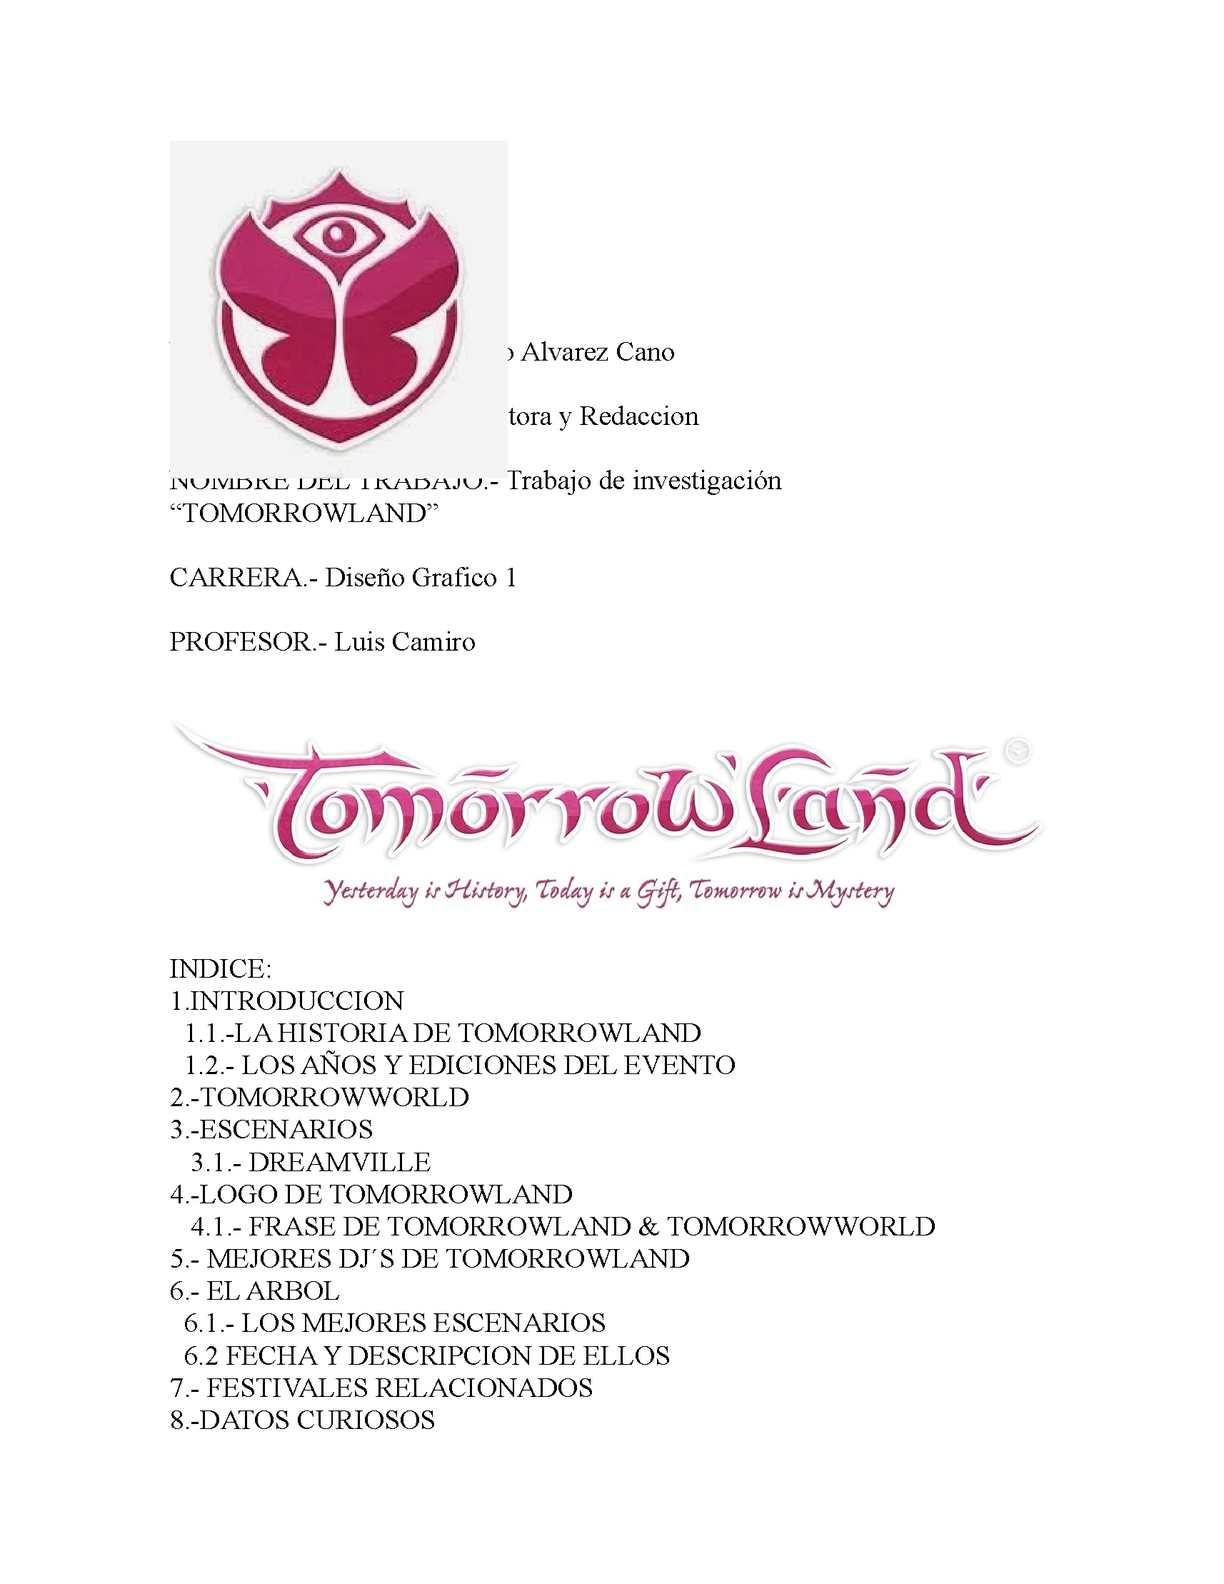 Calaméo Tomorrowland